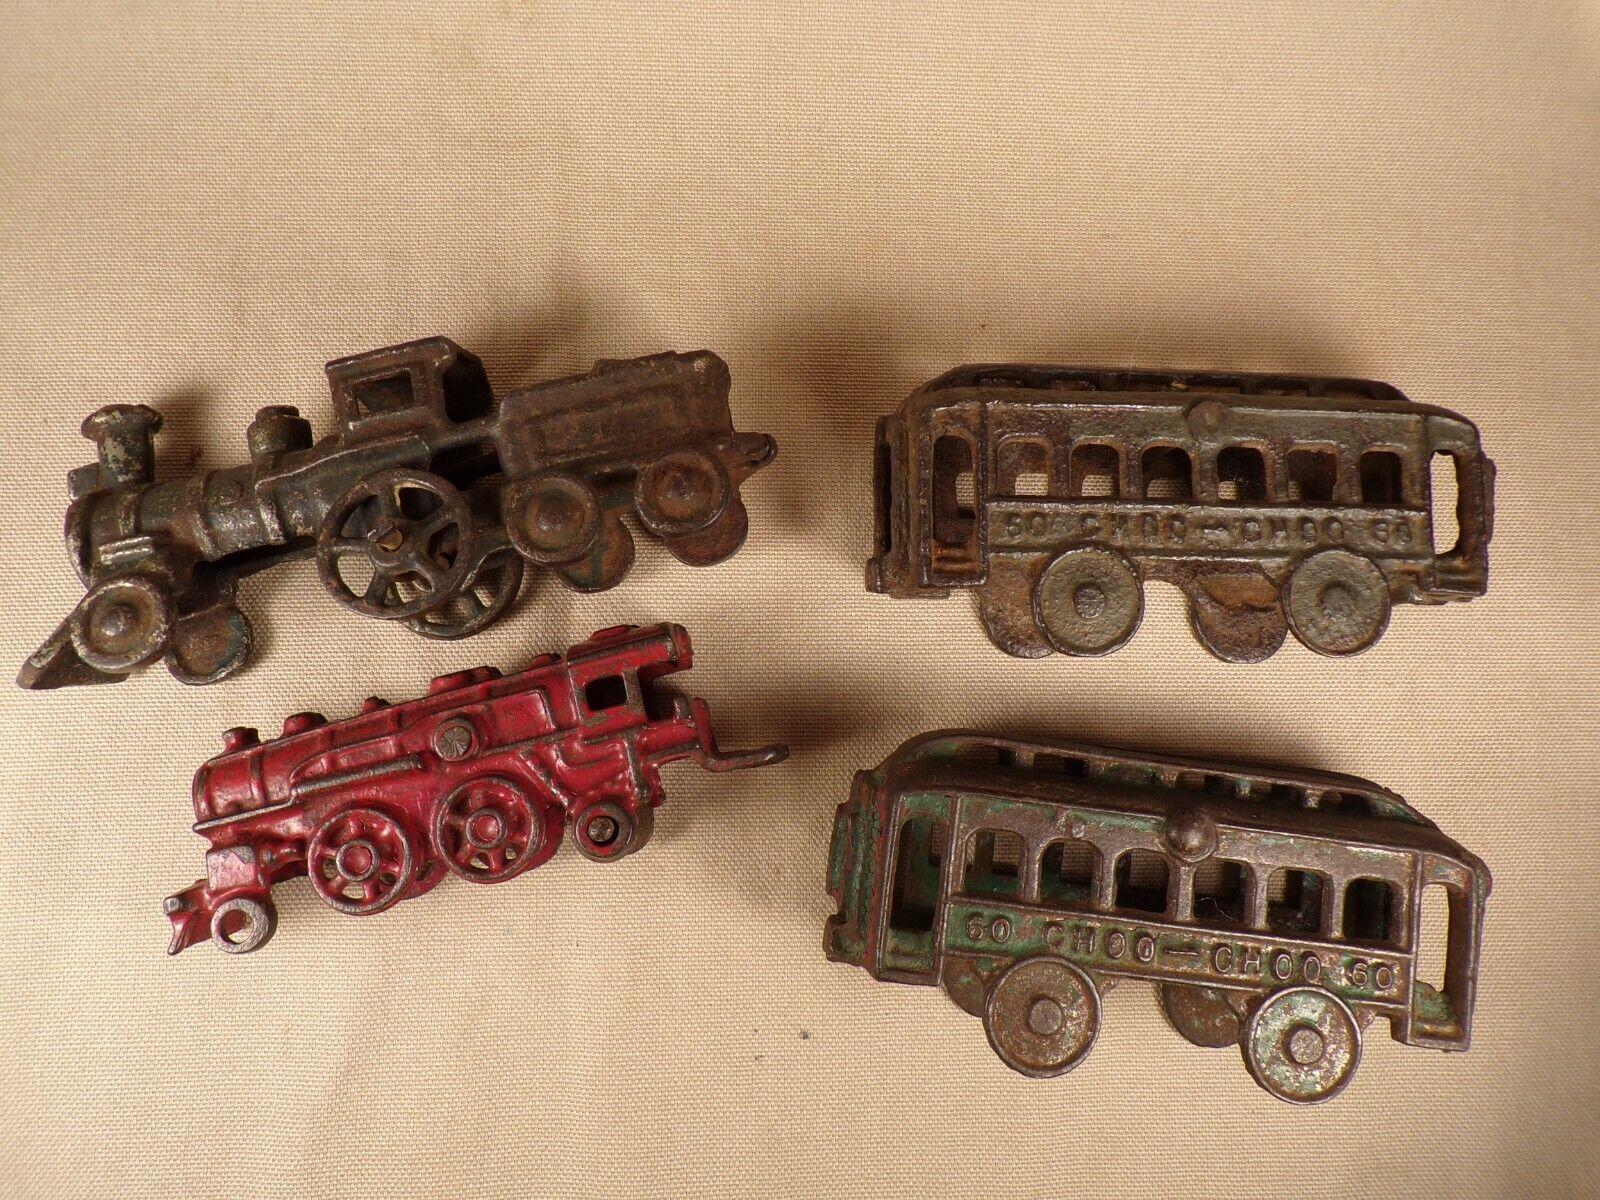 2 Antique Cast Iron Train Locomotive Engine e Passenger autos